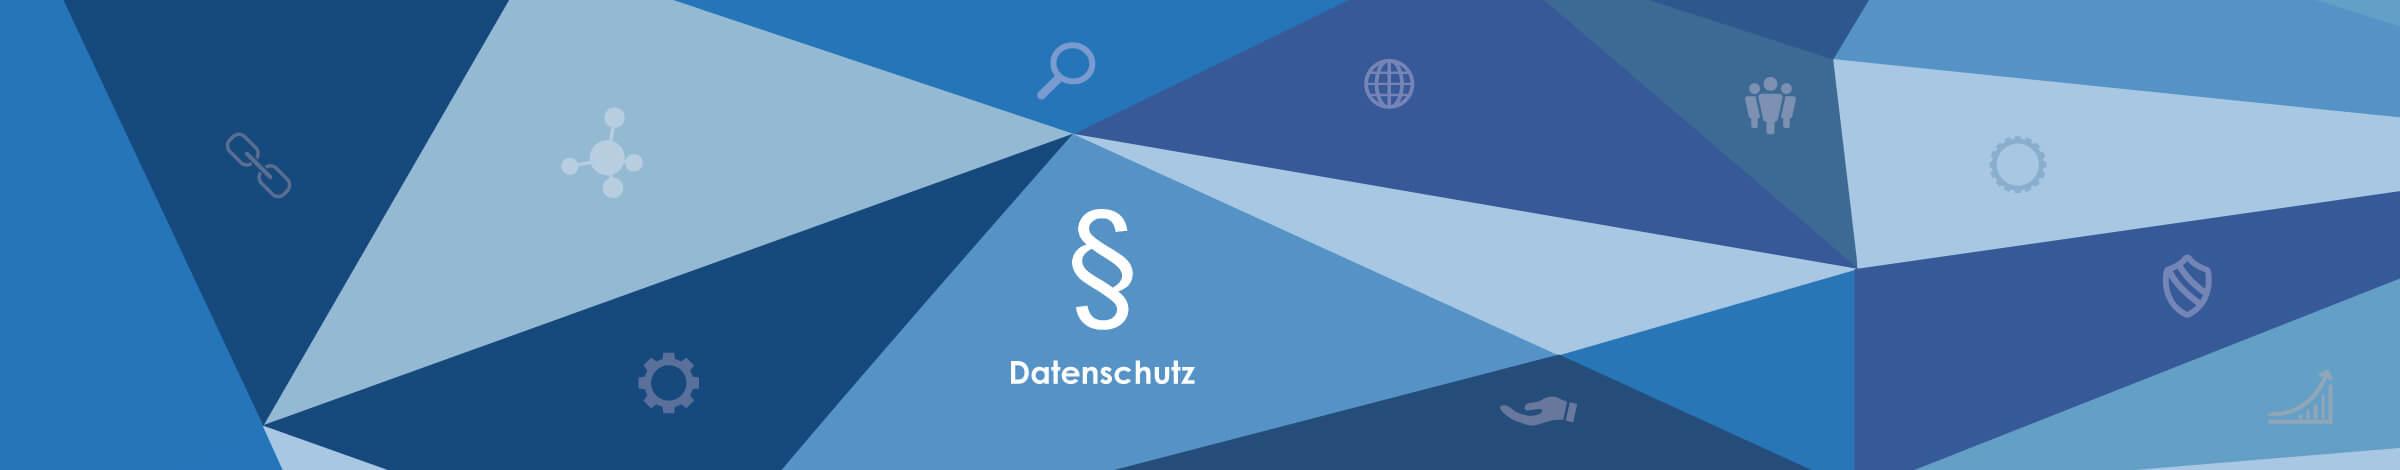 web_updates_kmu_wuk-ch_Datenschutz